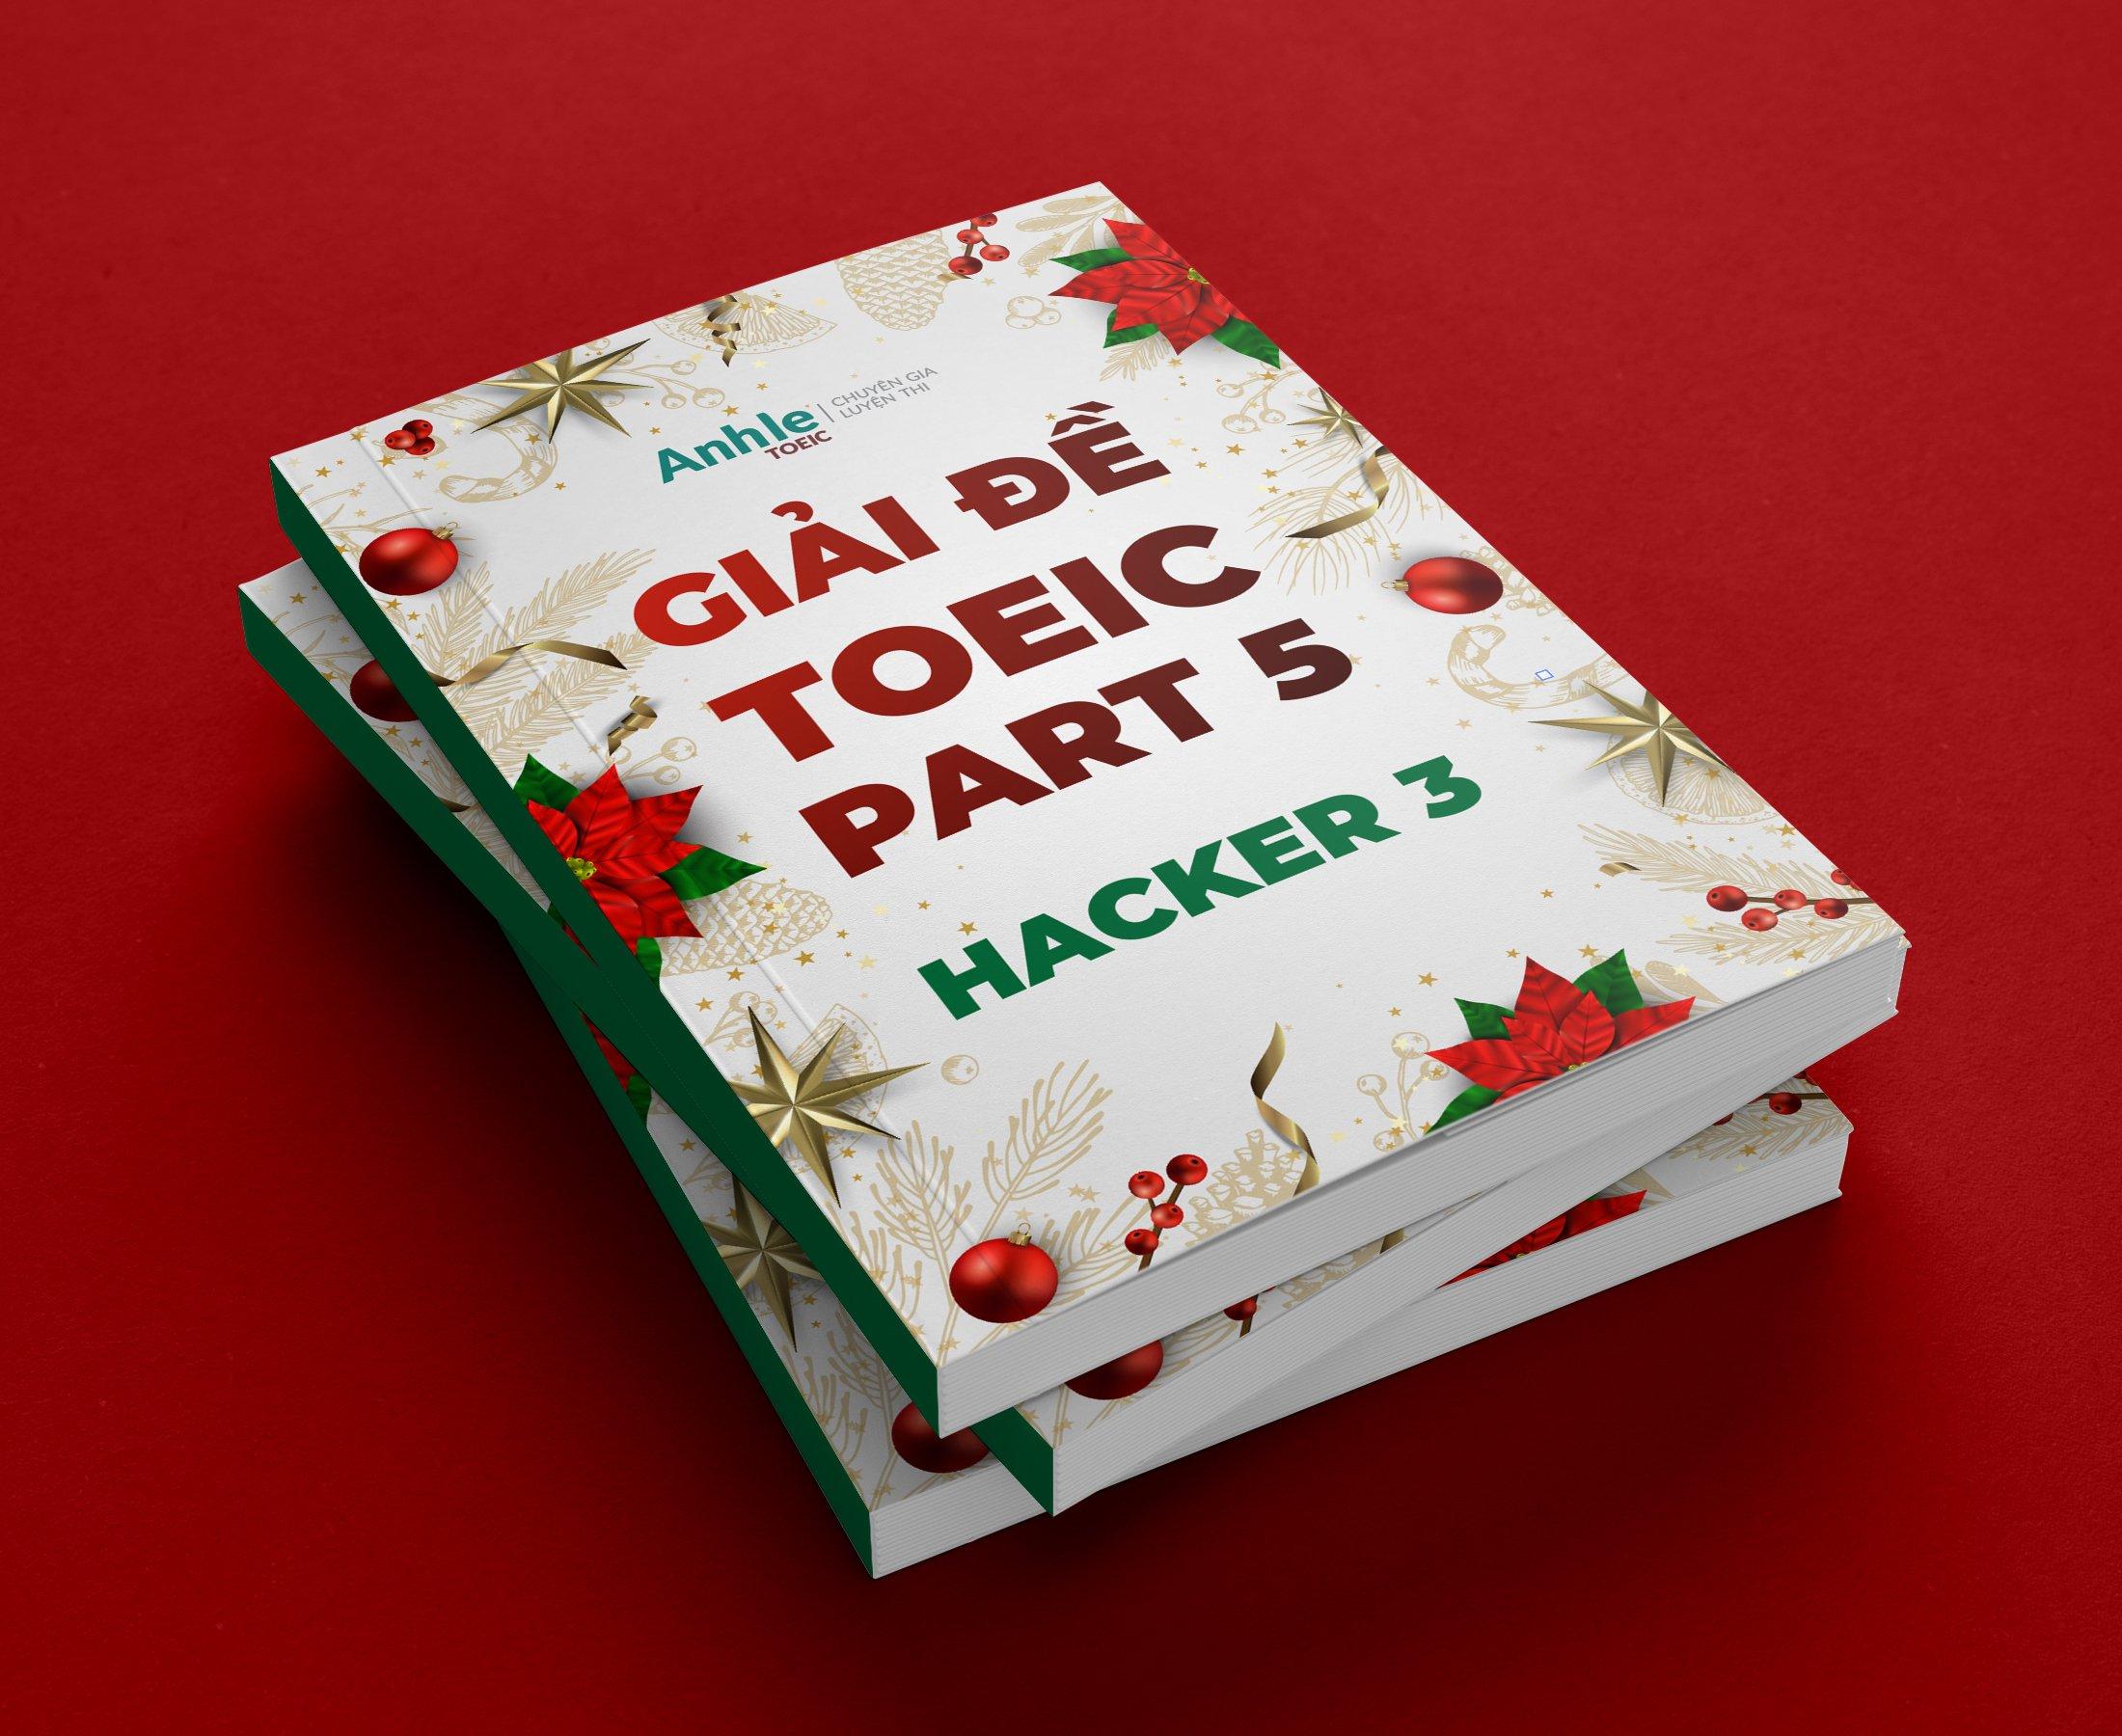 Giải chi tiết Hacker Toeic Part 5